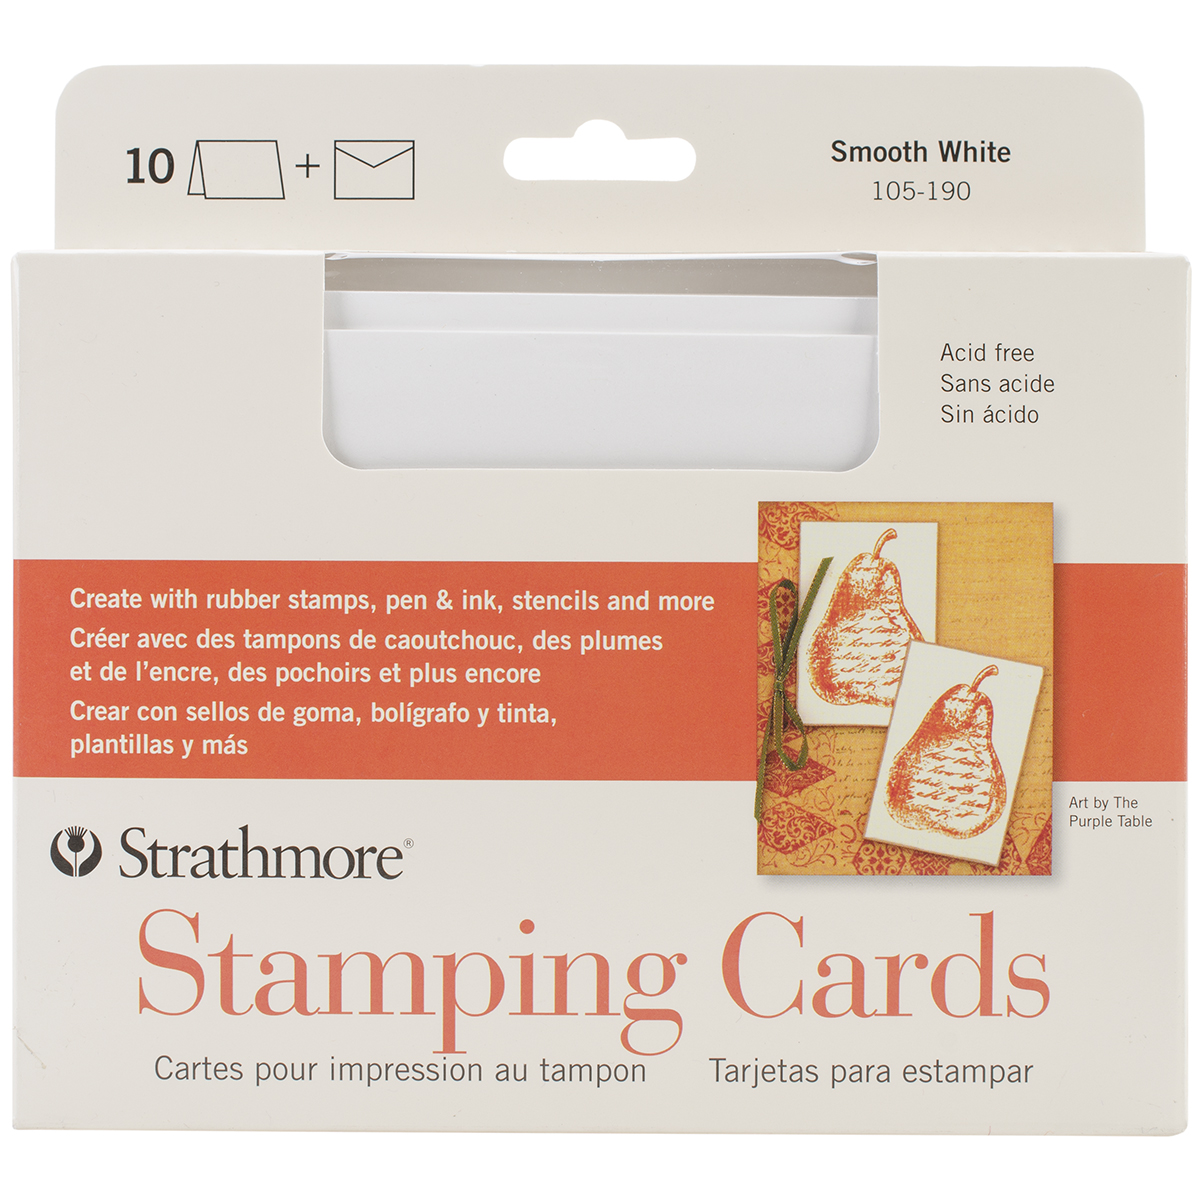 Strathmore Stamping Cards & Envelopes